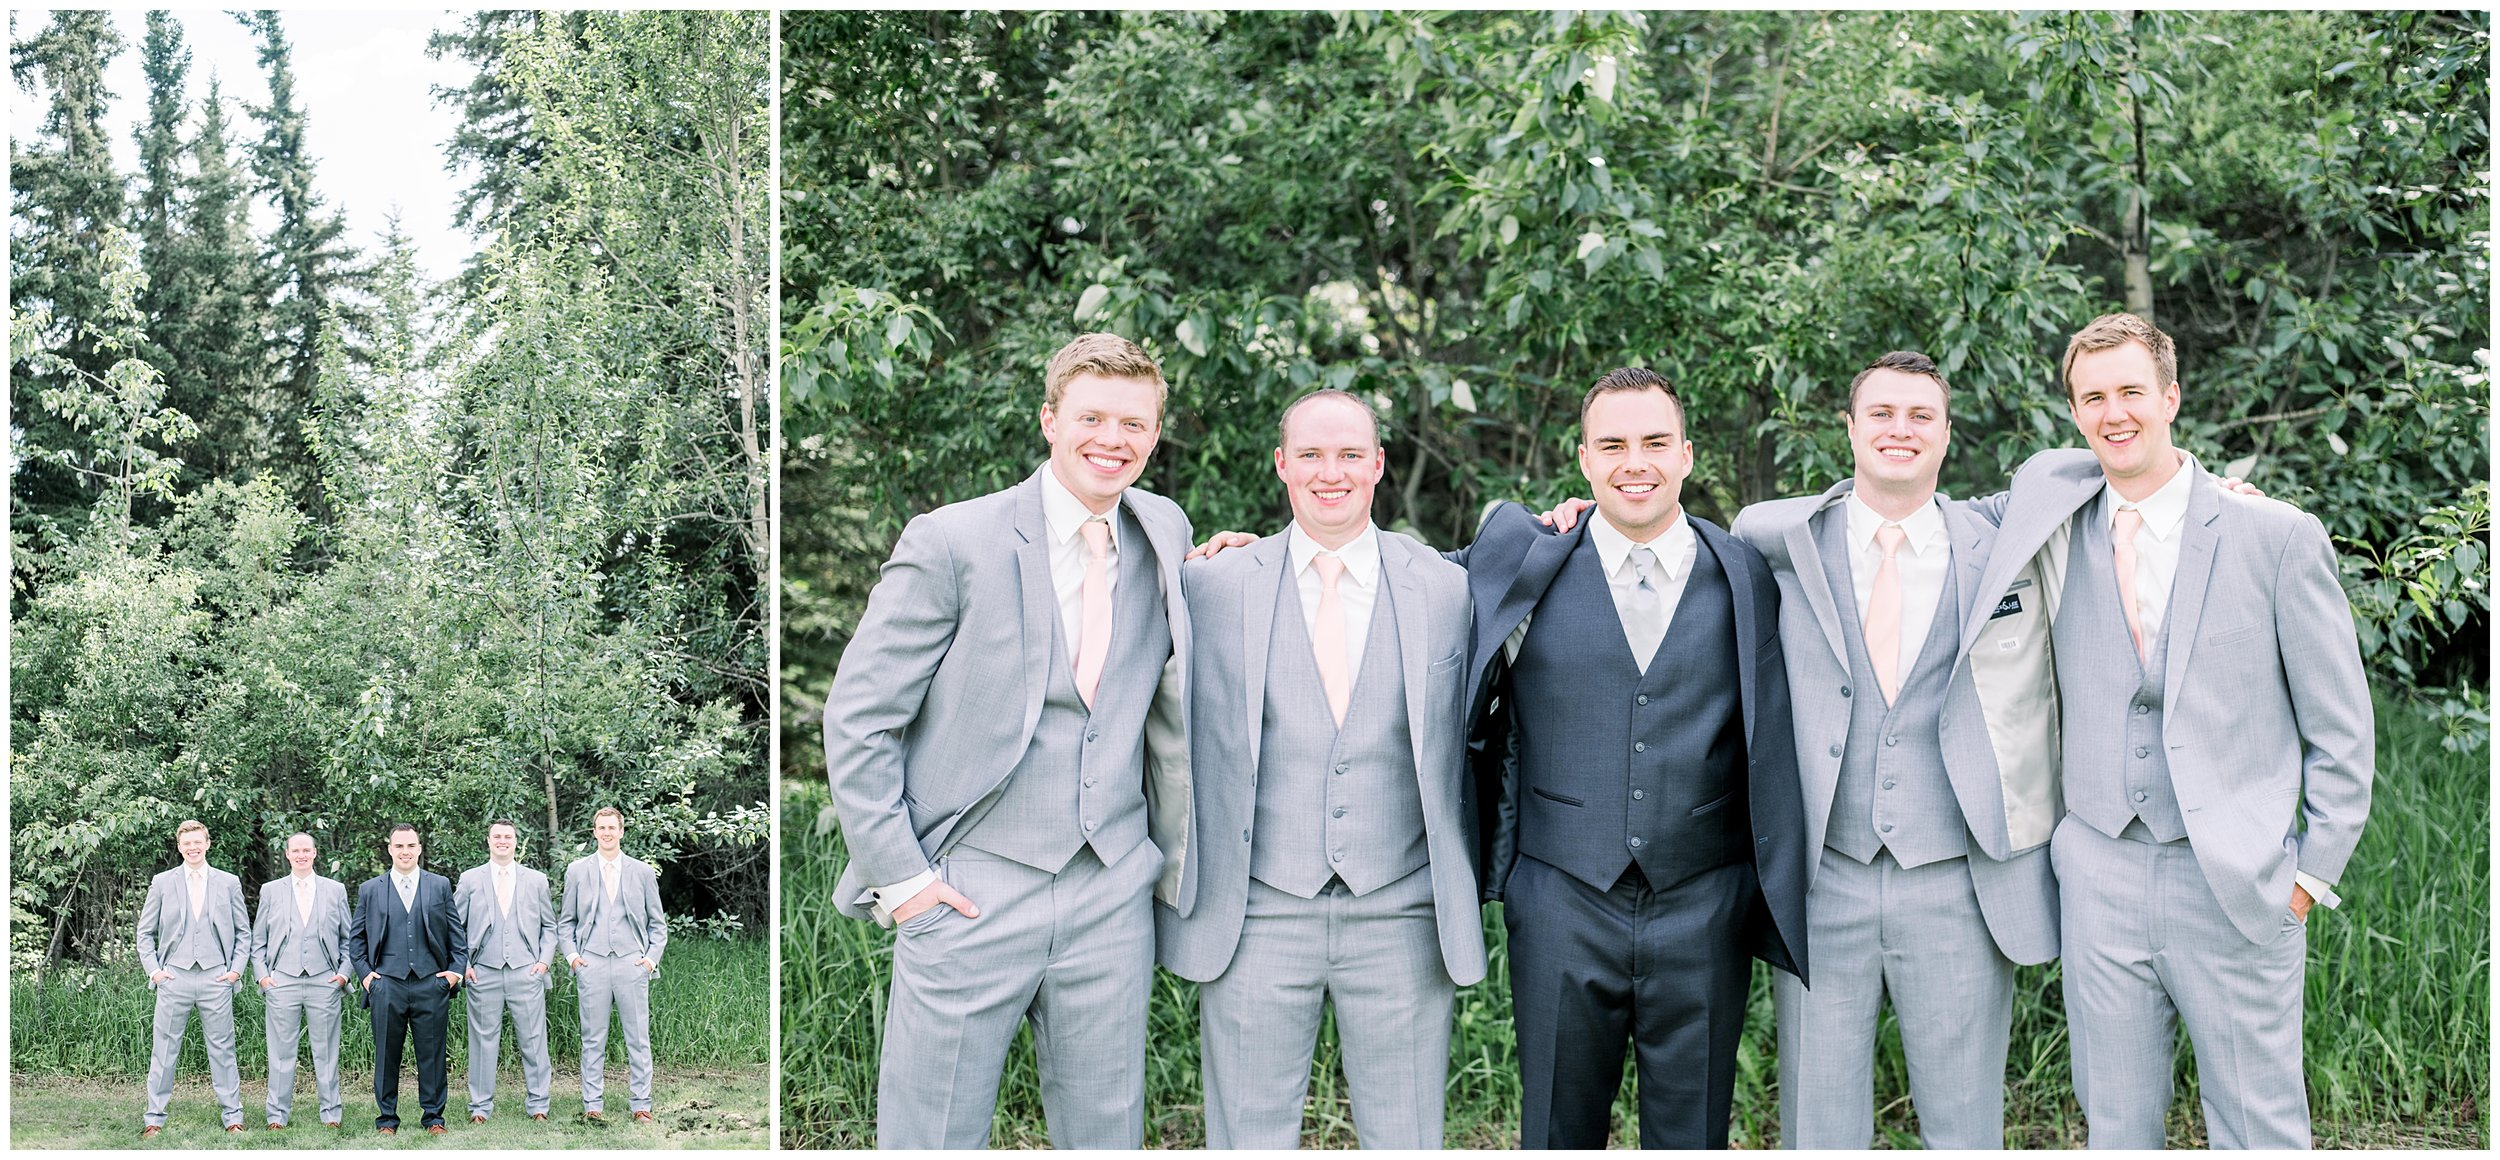 Alyssa-Poland-Photography_0605_alberta wedding.jpg